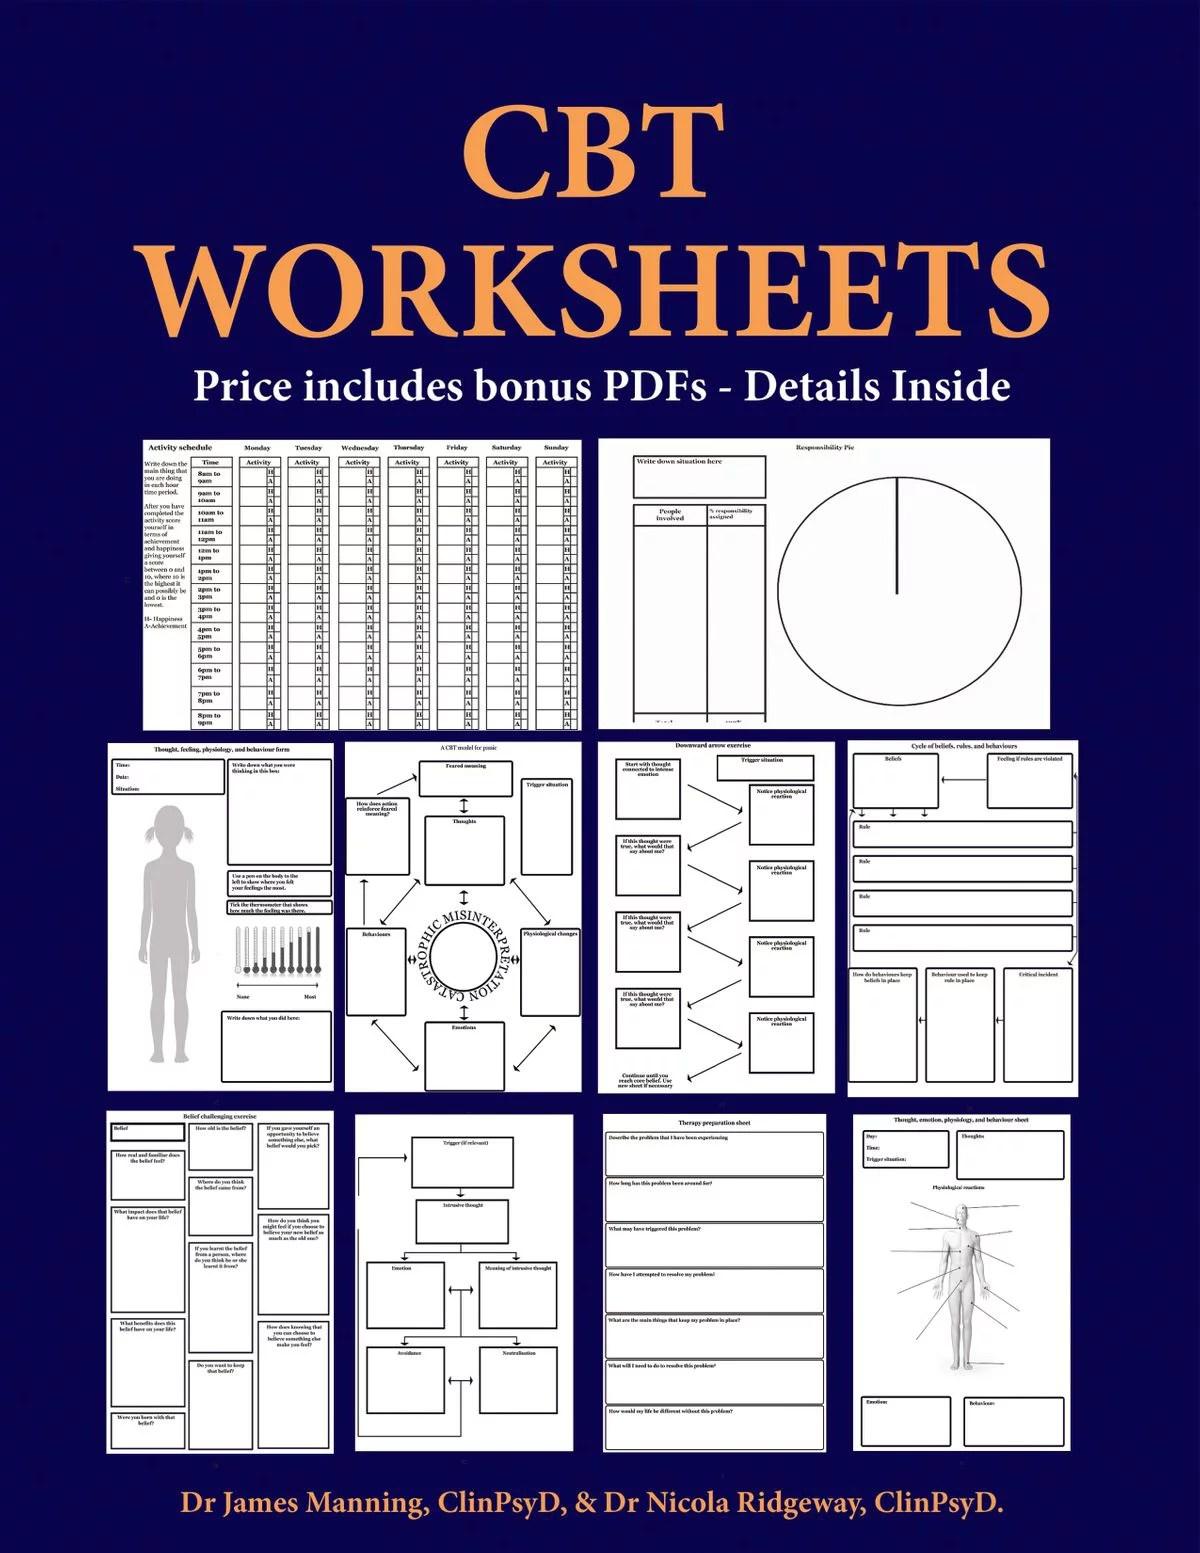 Cbt Worksheets Cbt Worksheets For Cbt Therapists In